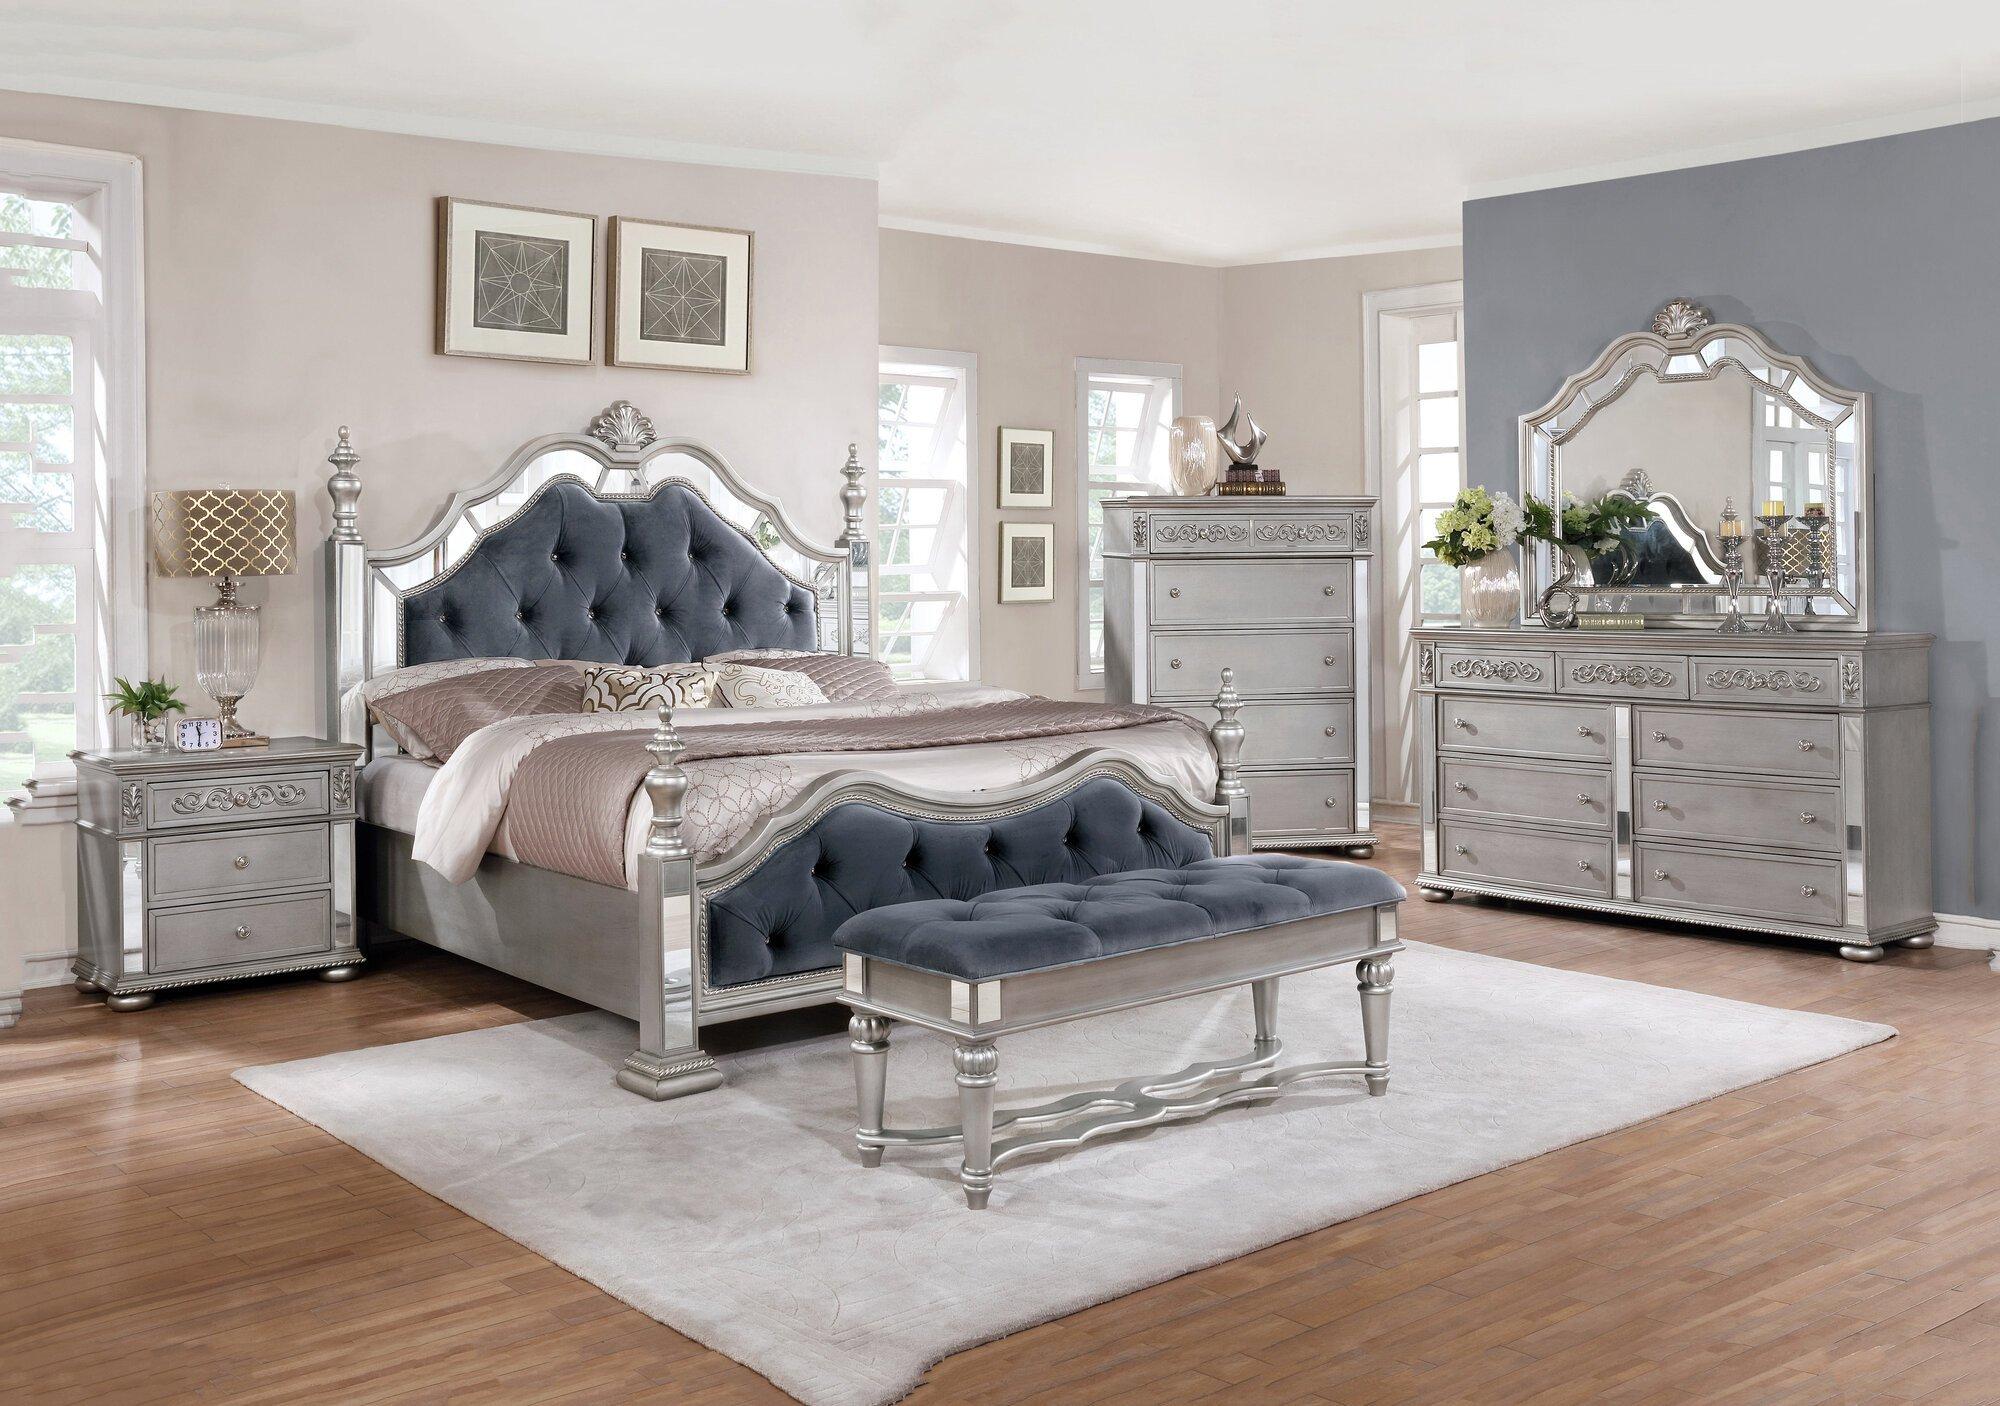 Silver Grey Bedroom Furniture New Details About Rosdorf Park Kenton Standard 5 Piece Bedroom Set